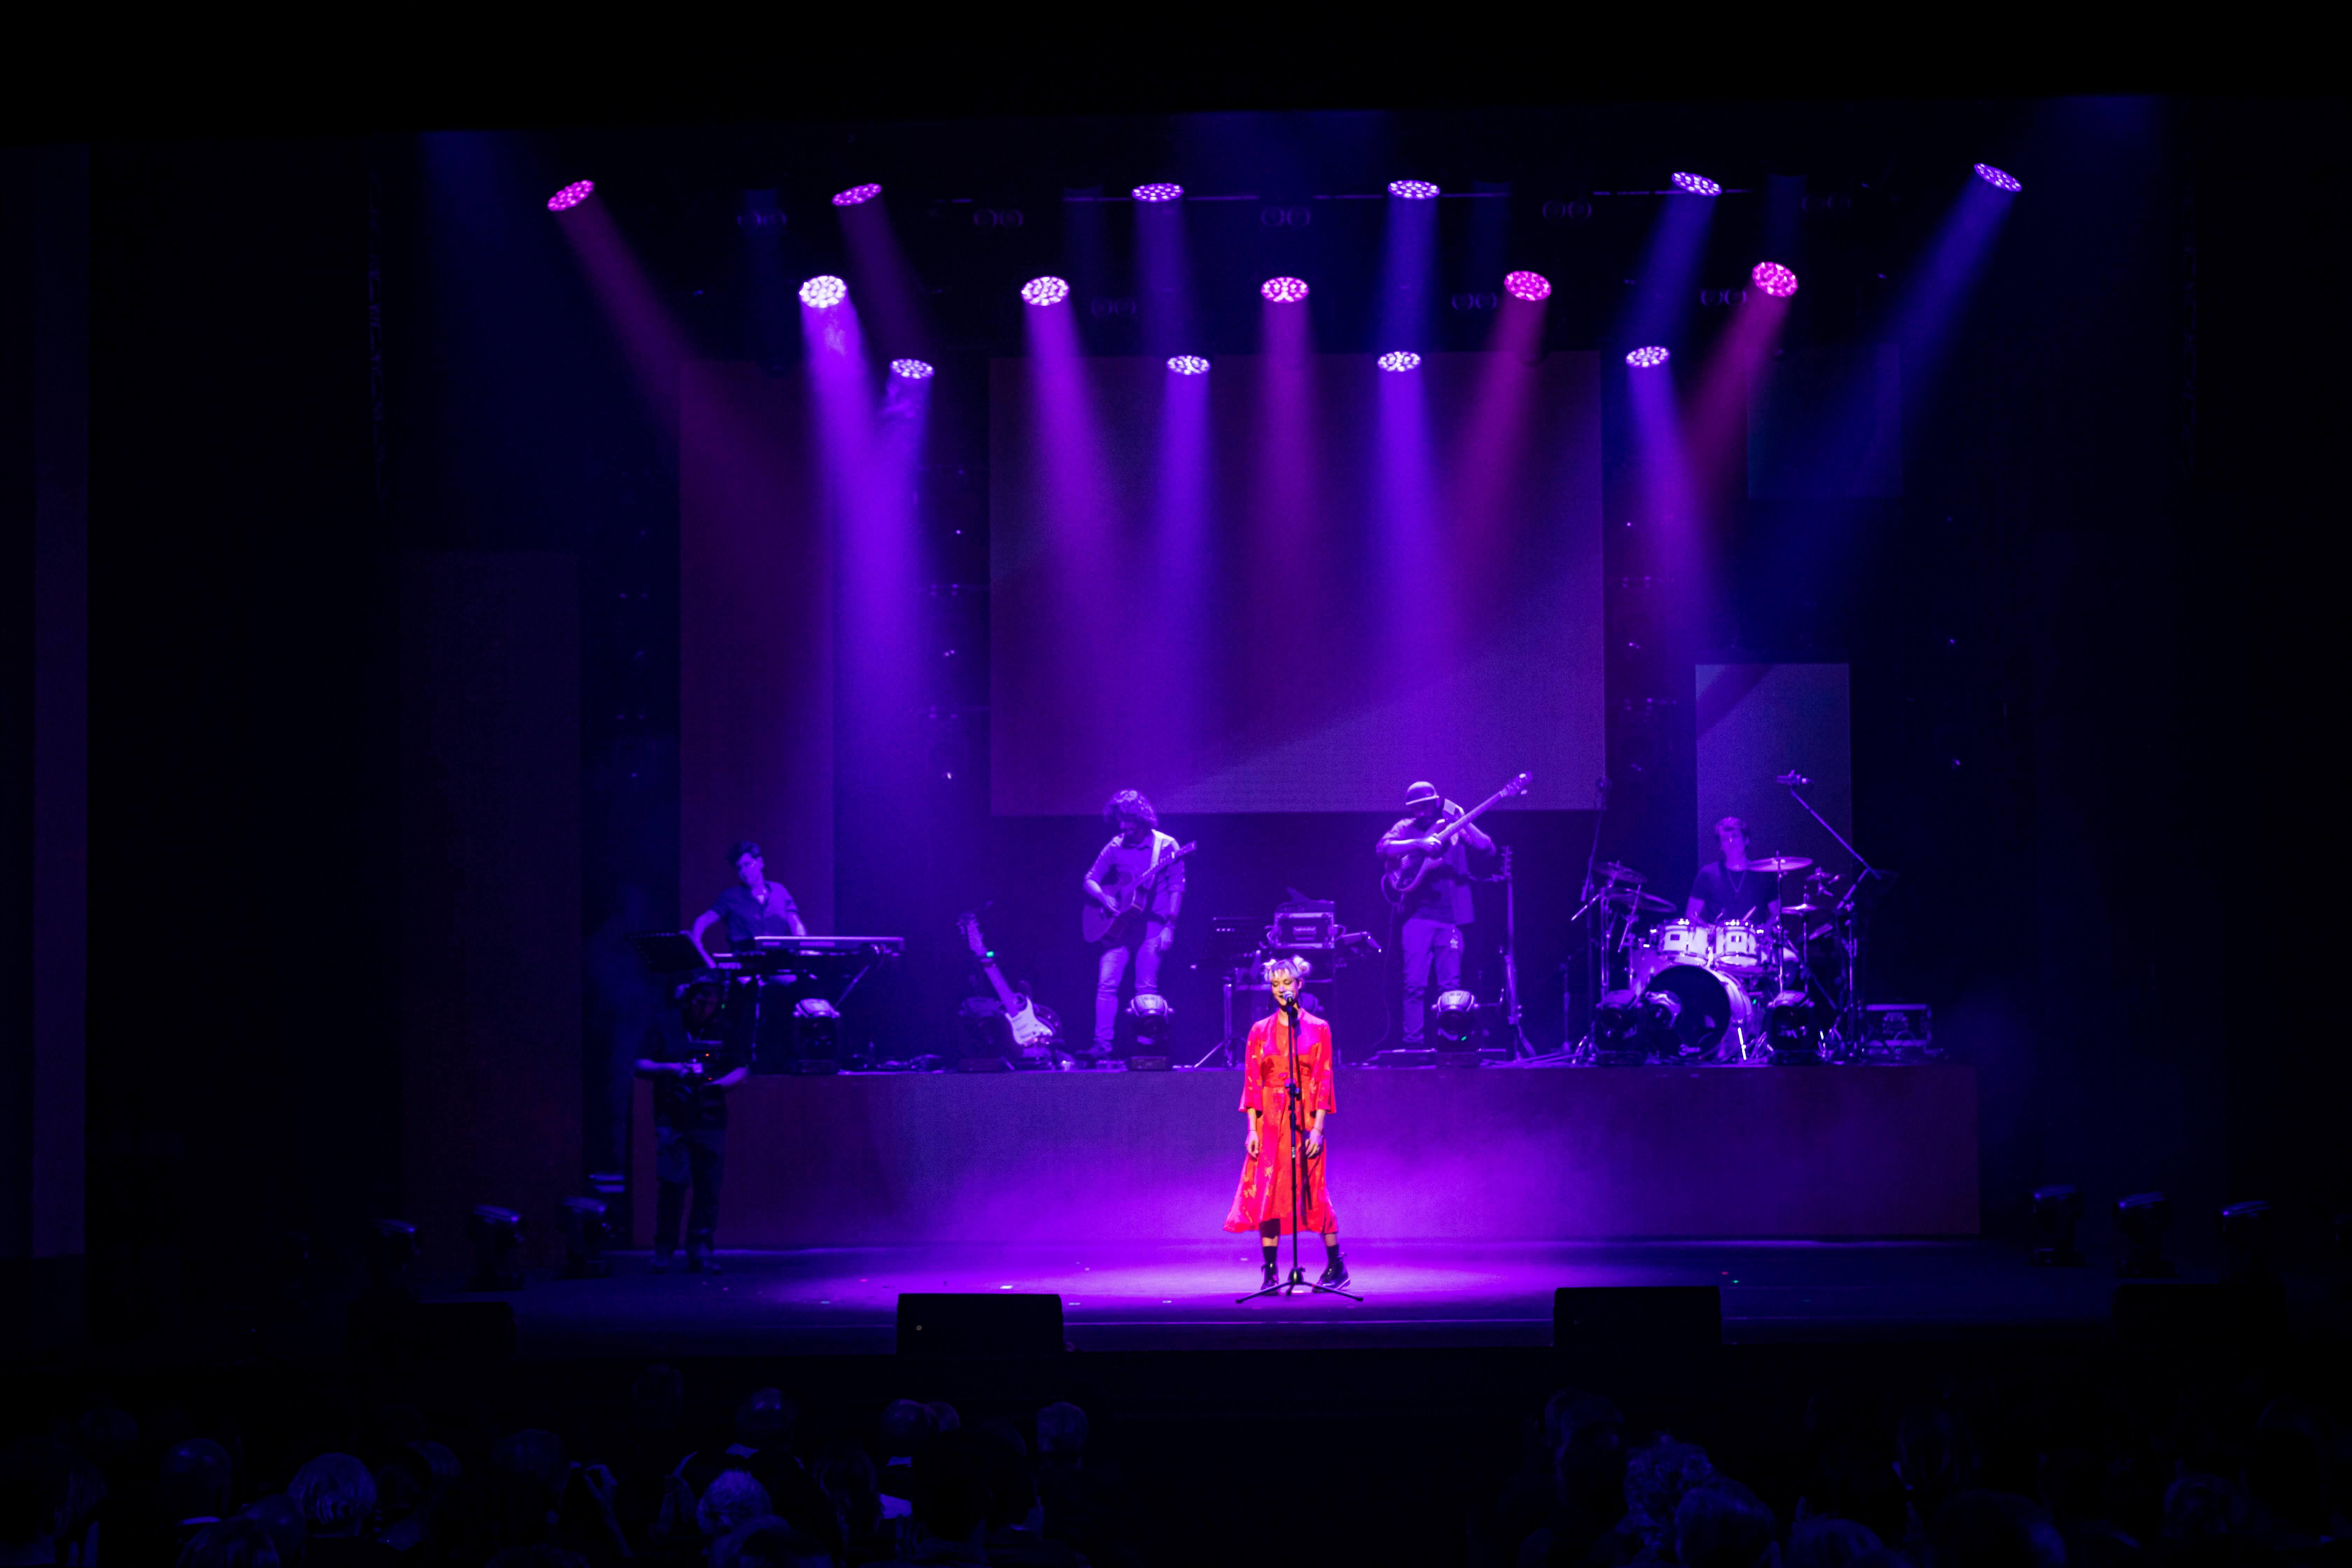 Fonoprint-bma-about-bologna-teatro-duse-ph-Laura-Bessega-11